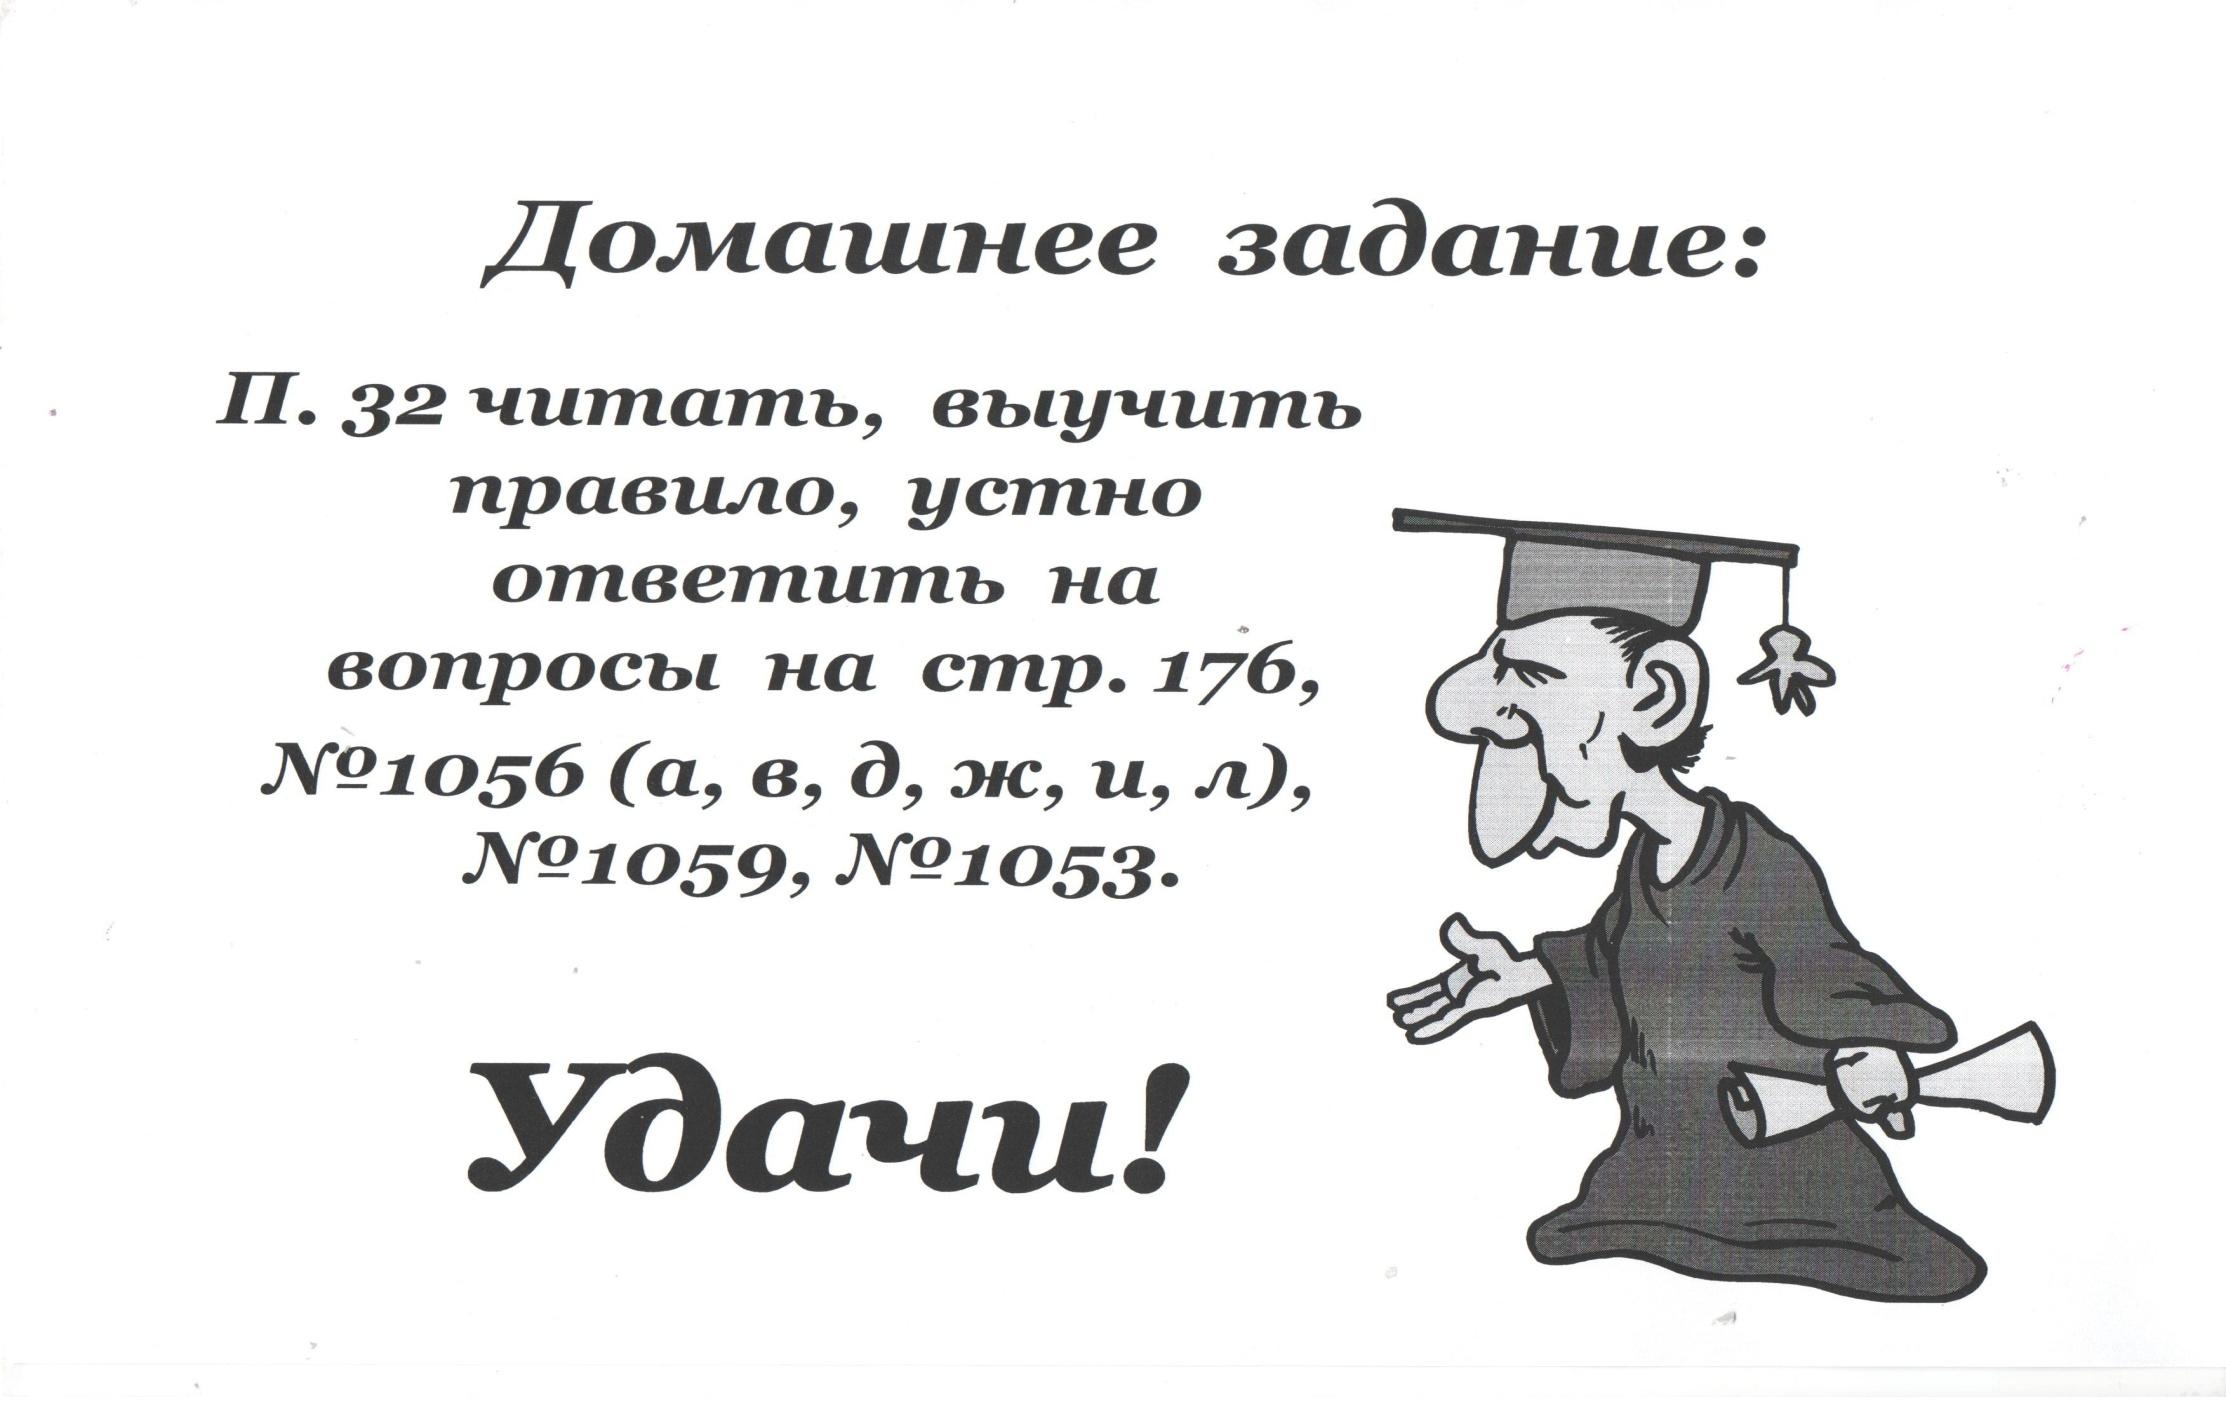 C:\Documents and Settings\Школа\Мои документы\Мои рисунки\Изображение\Изображение 046.jpg